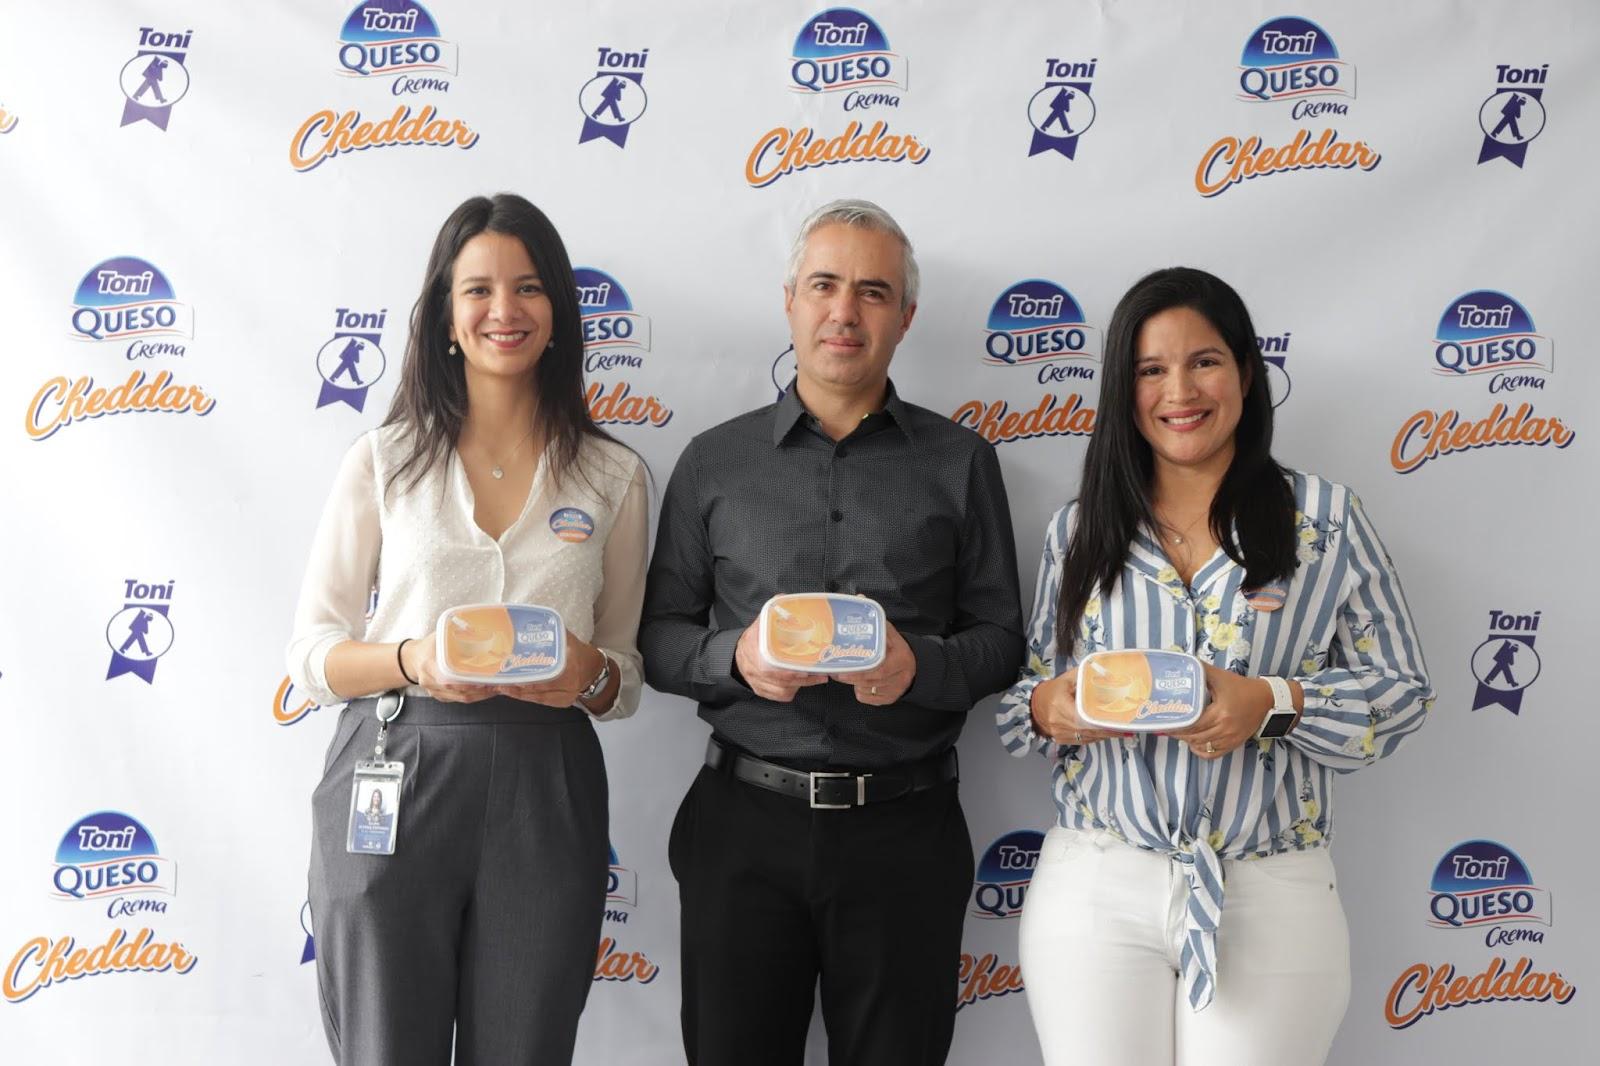 Tonicorp lanza al mercado su nuevo toni queso crema cheddar